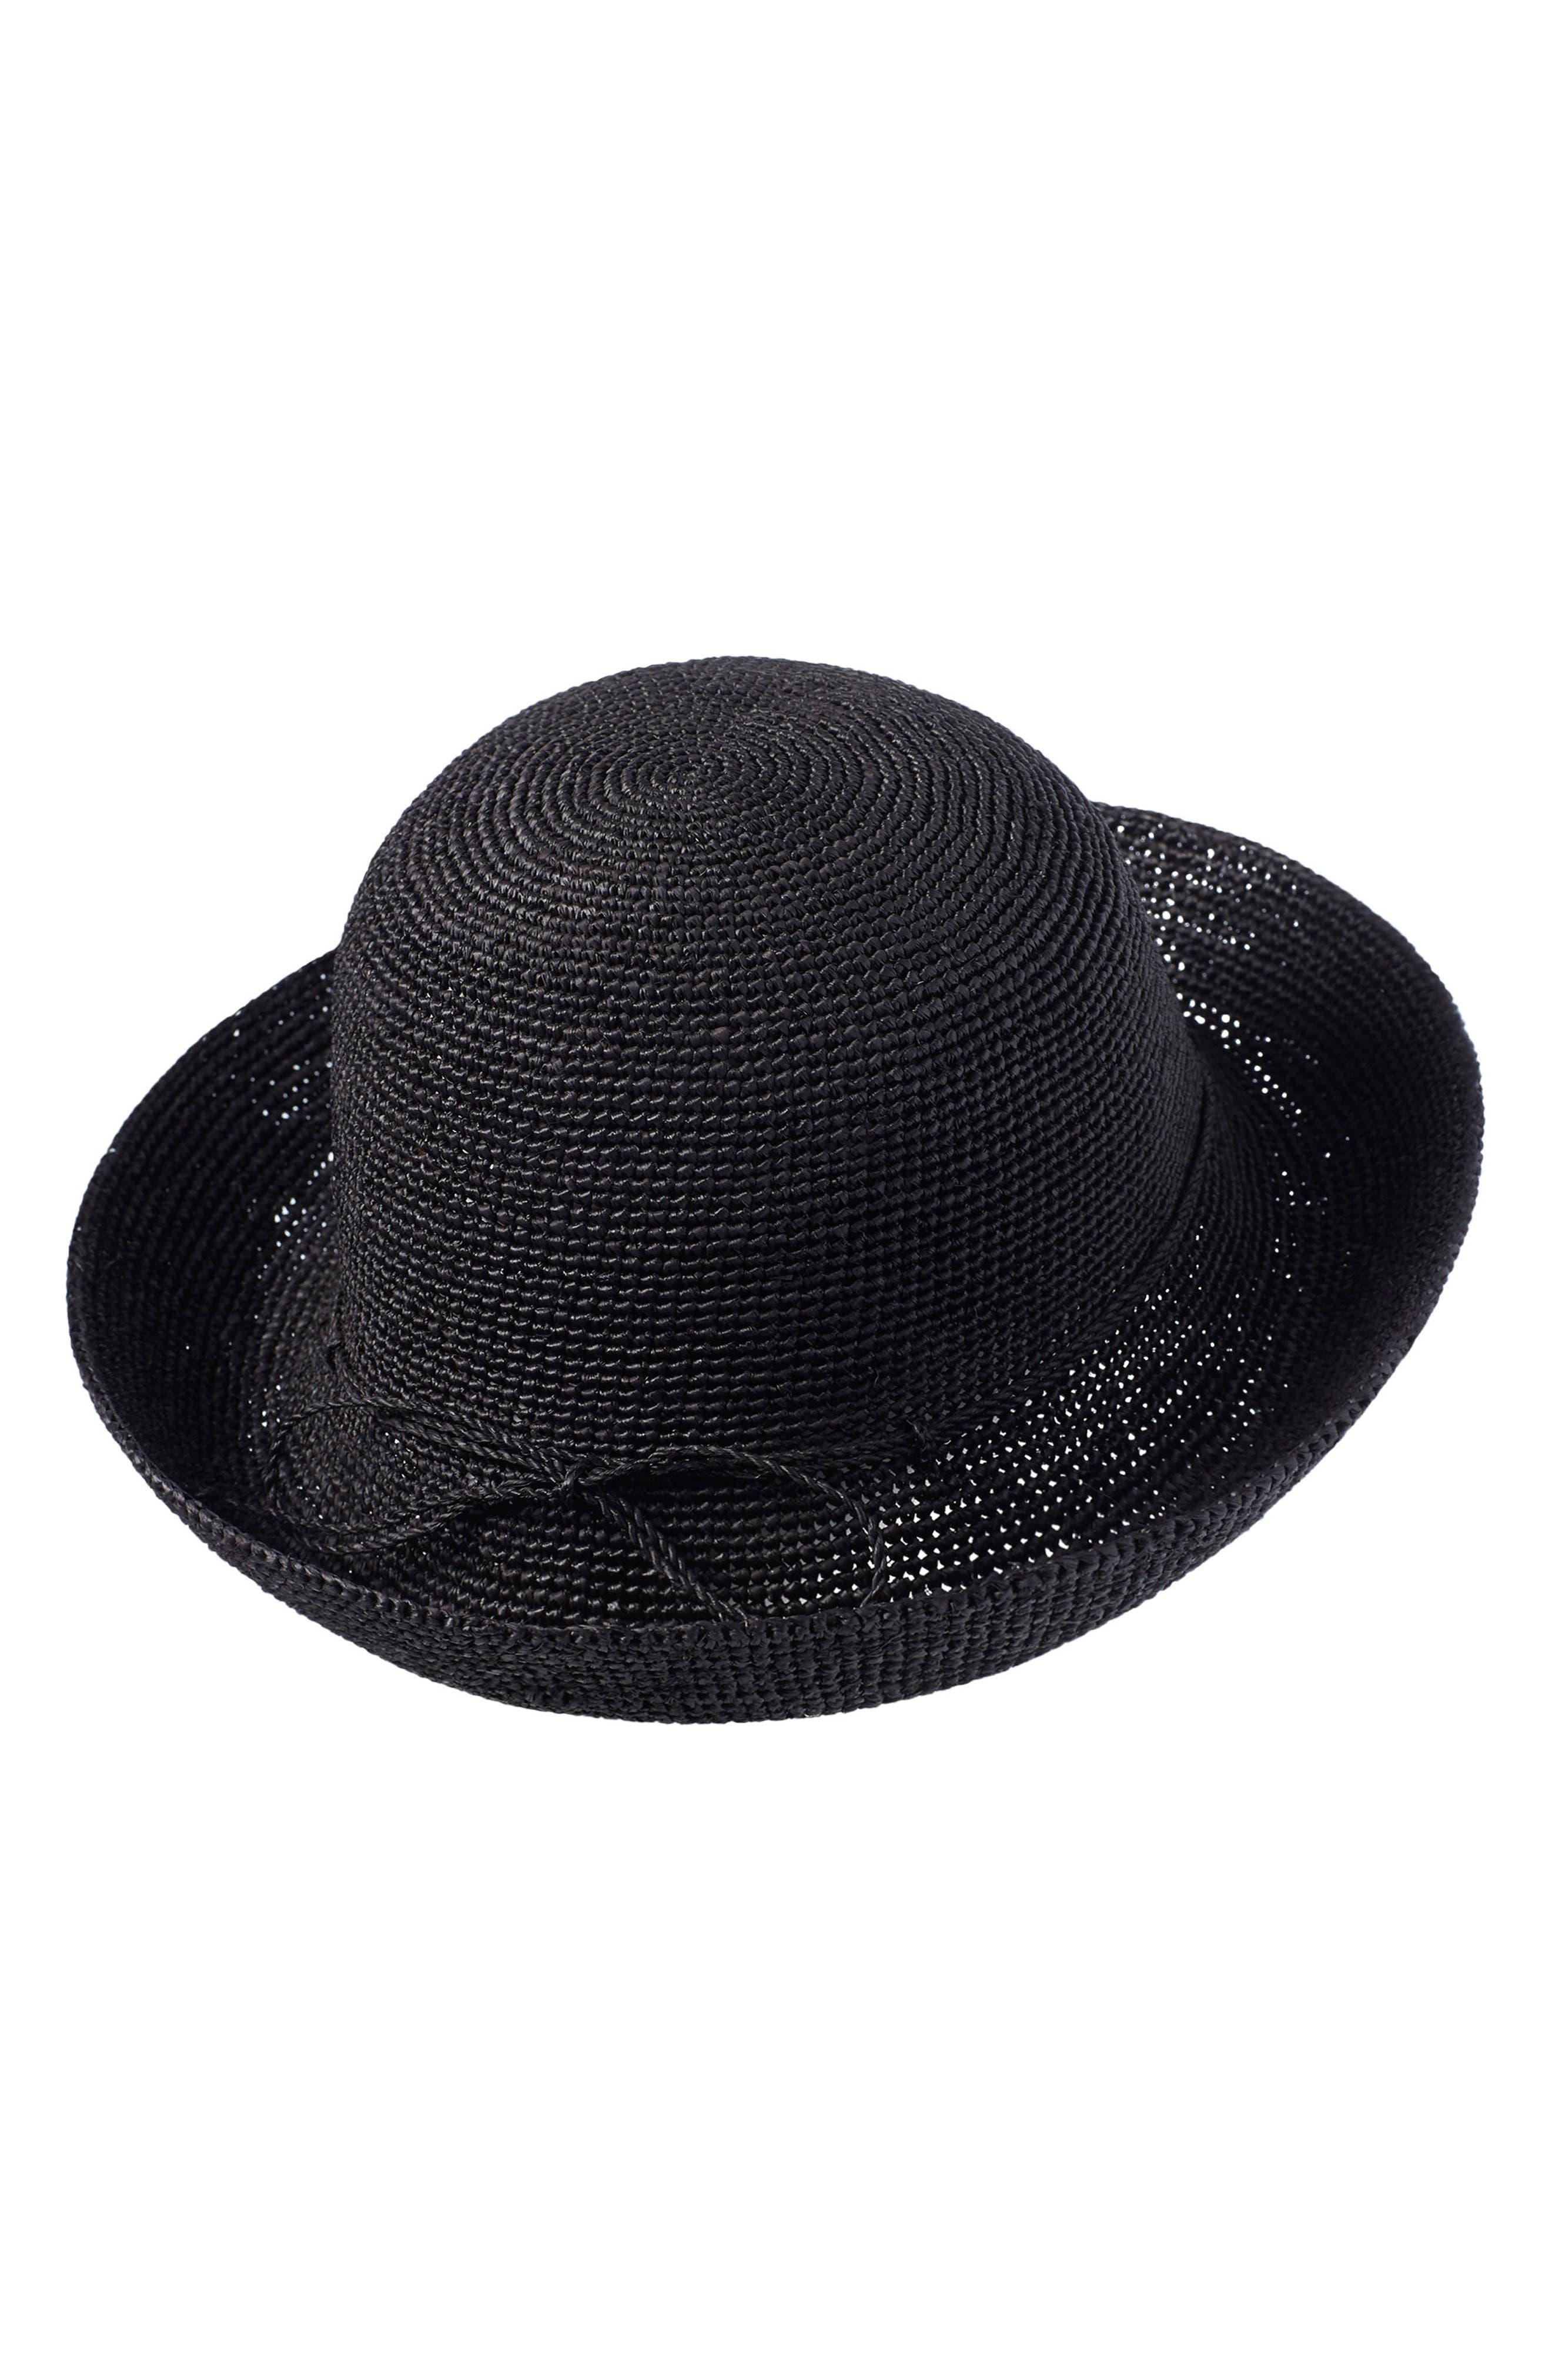 Classic Upturn Crocheted Raffia Hat,                             Main thumbnail 1, color,                             001